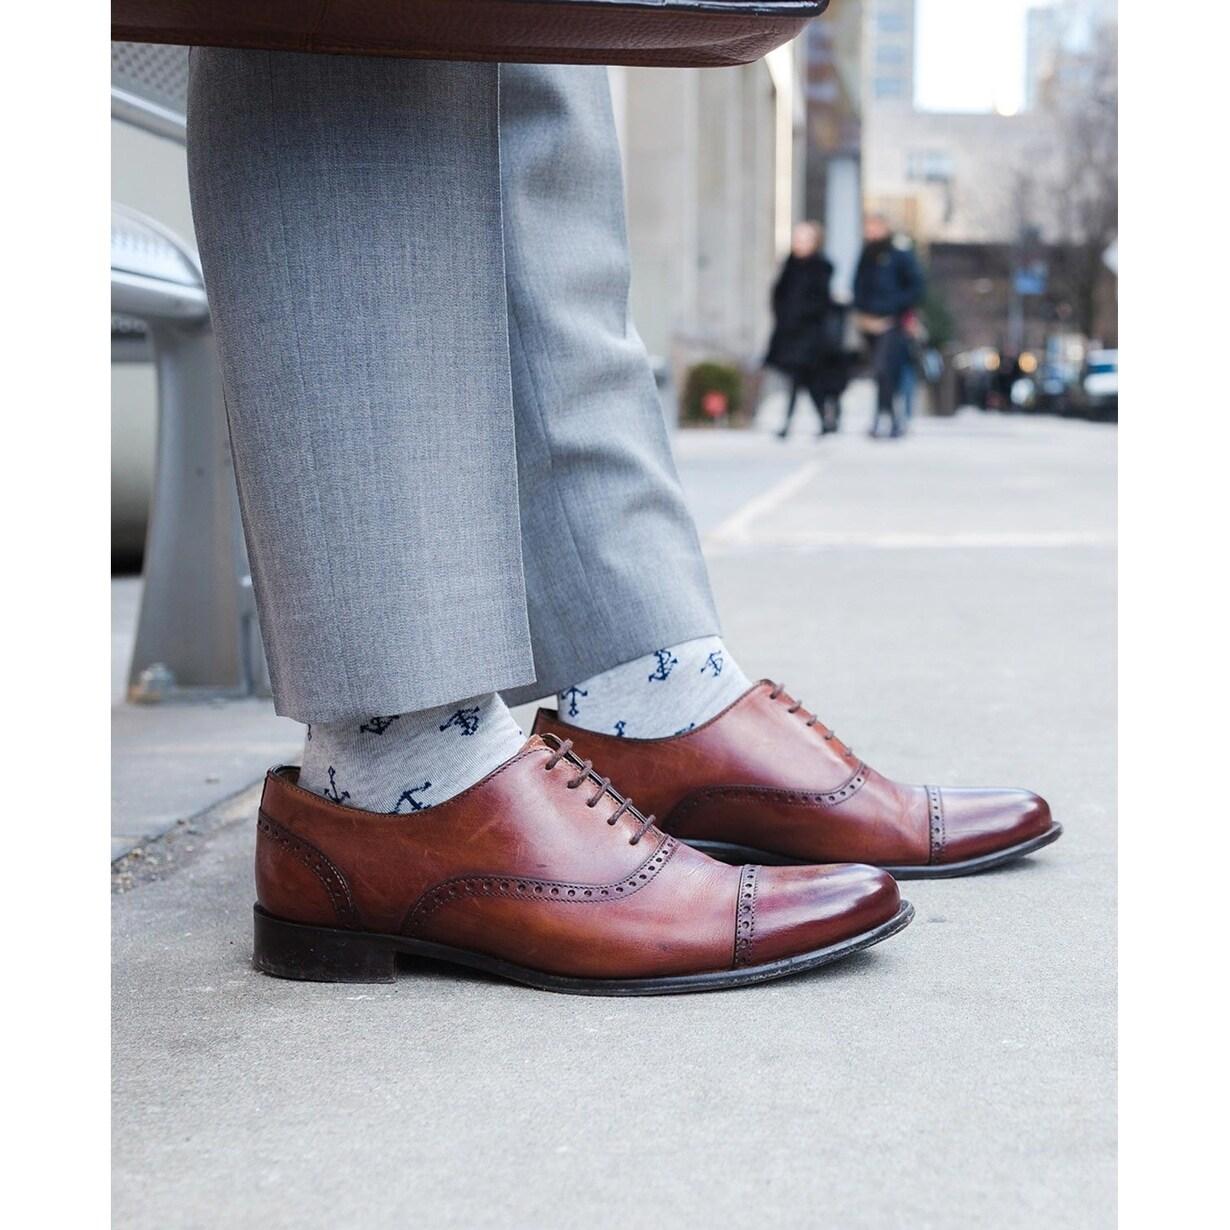 Nautica Mens Tie Socks Set Pocket Square